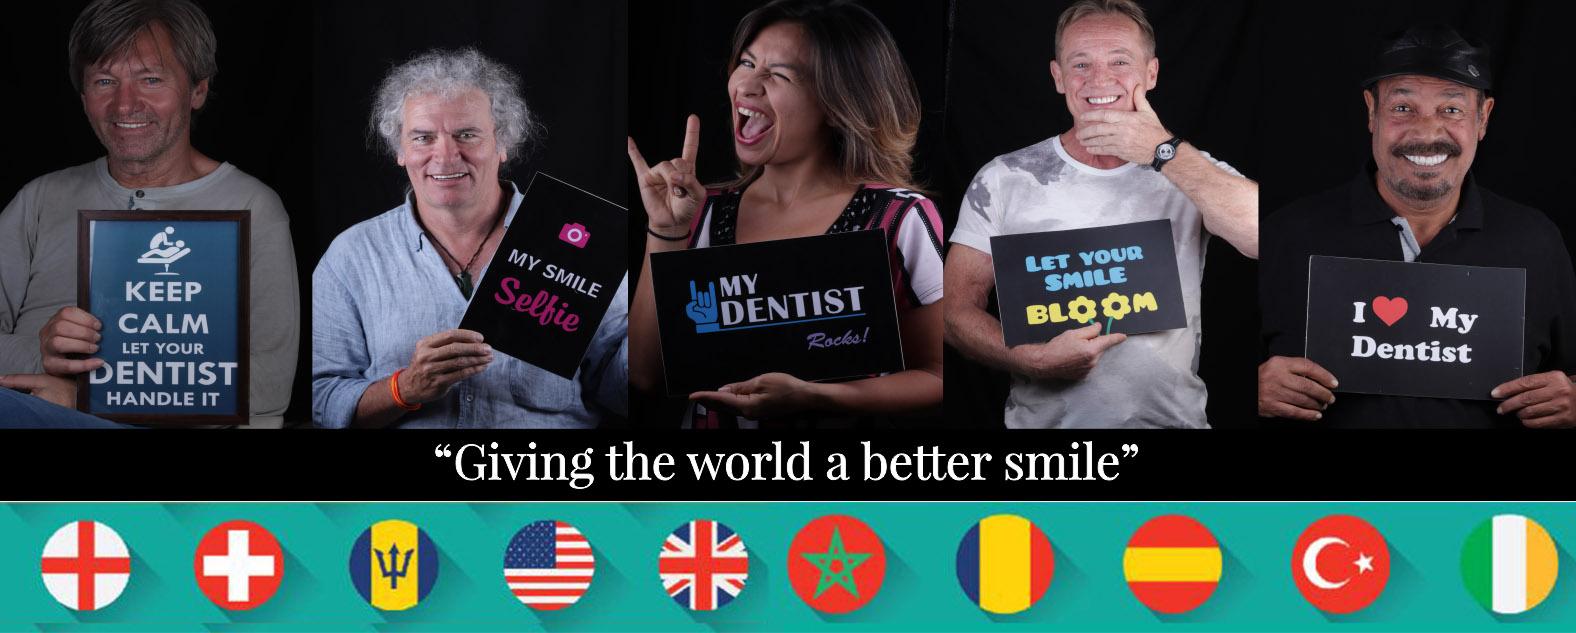 https://www.aestheticsmilesindia.com/wp-content/uploads/2021/03/dental-tourism-banner-1.jpg